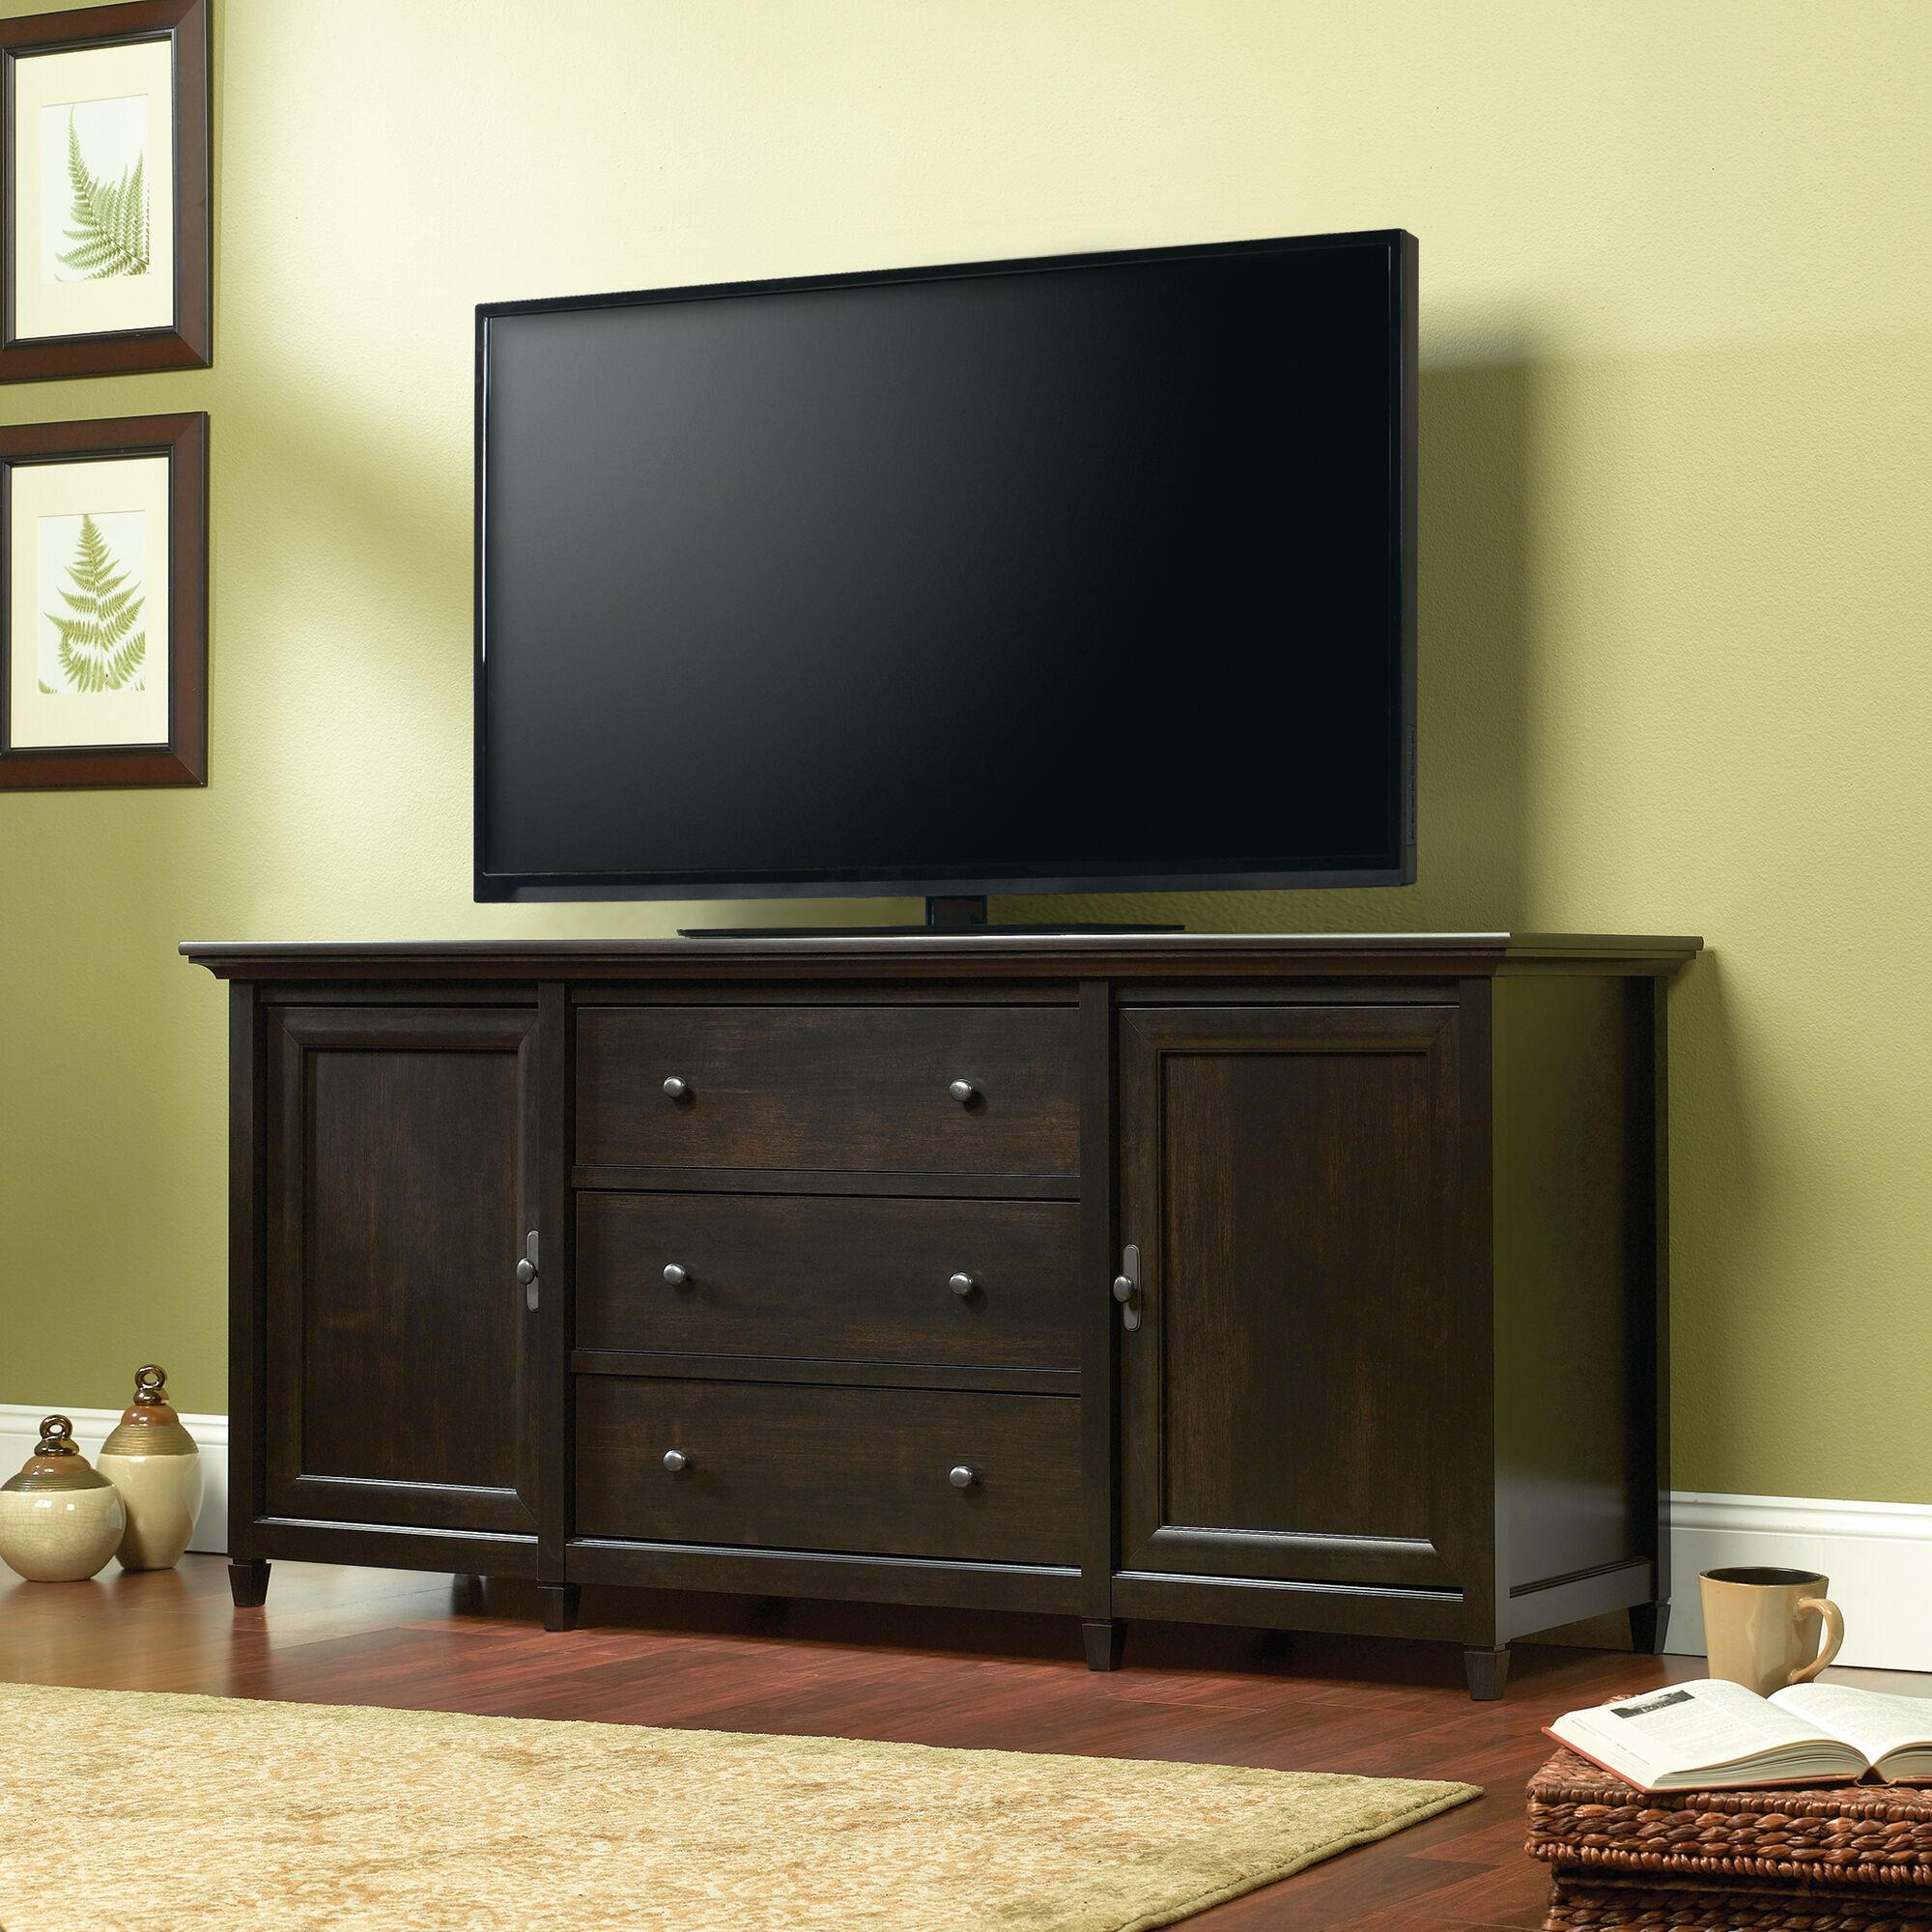 Solid Wood Tv Credenza: Three-Drawer Solid Wood Credenza In Estate Black